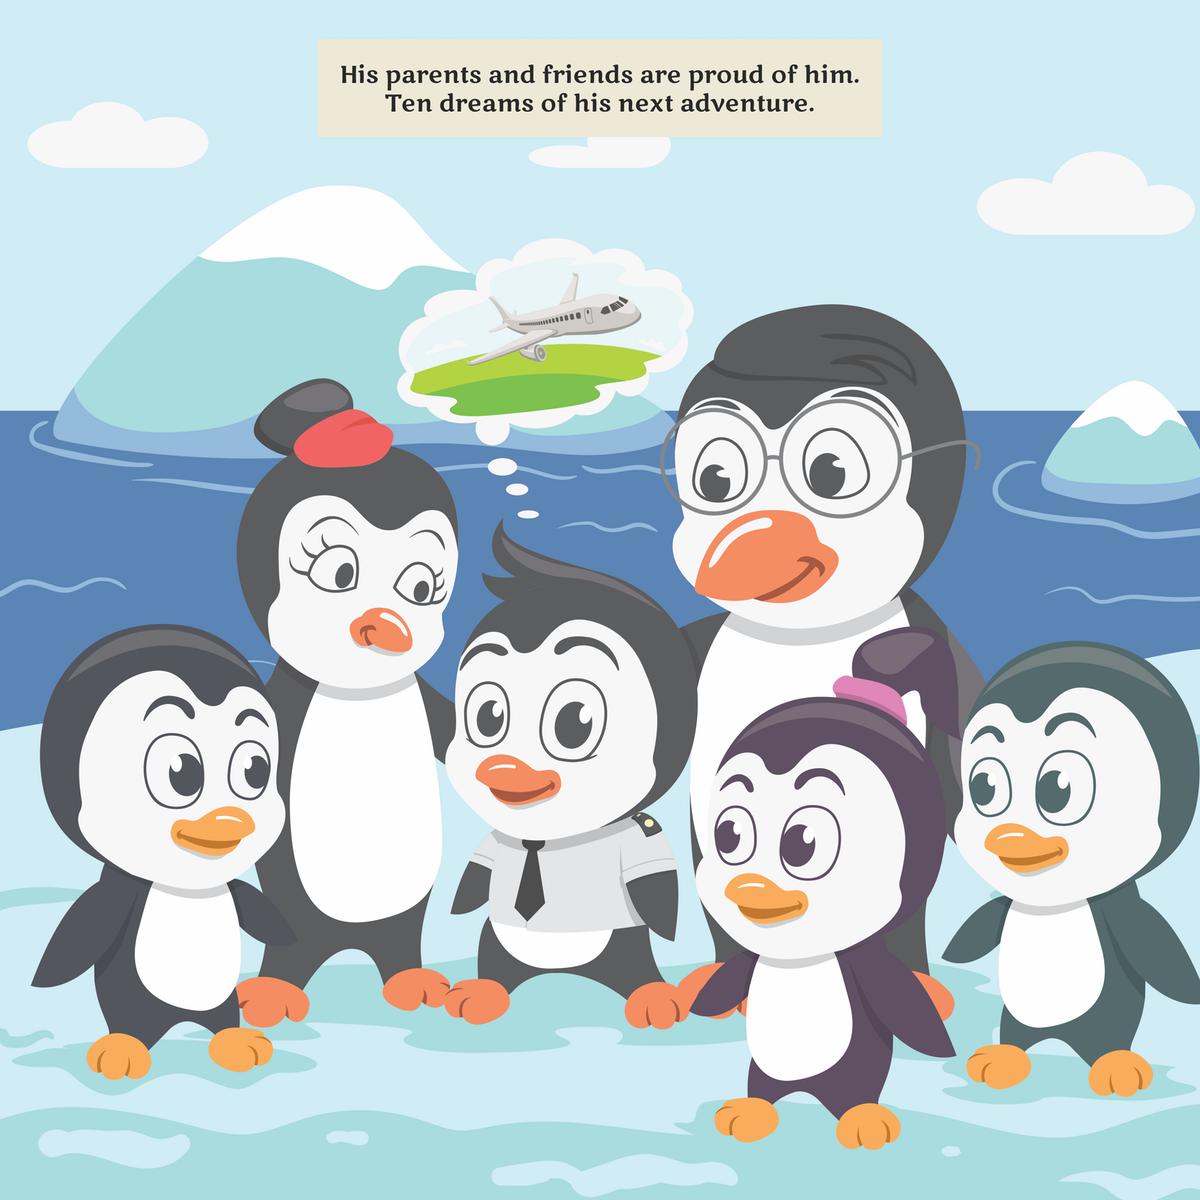 Penguin pilot illustrations set